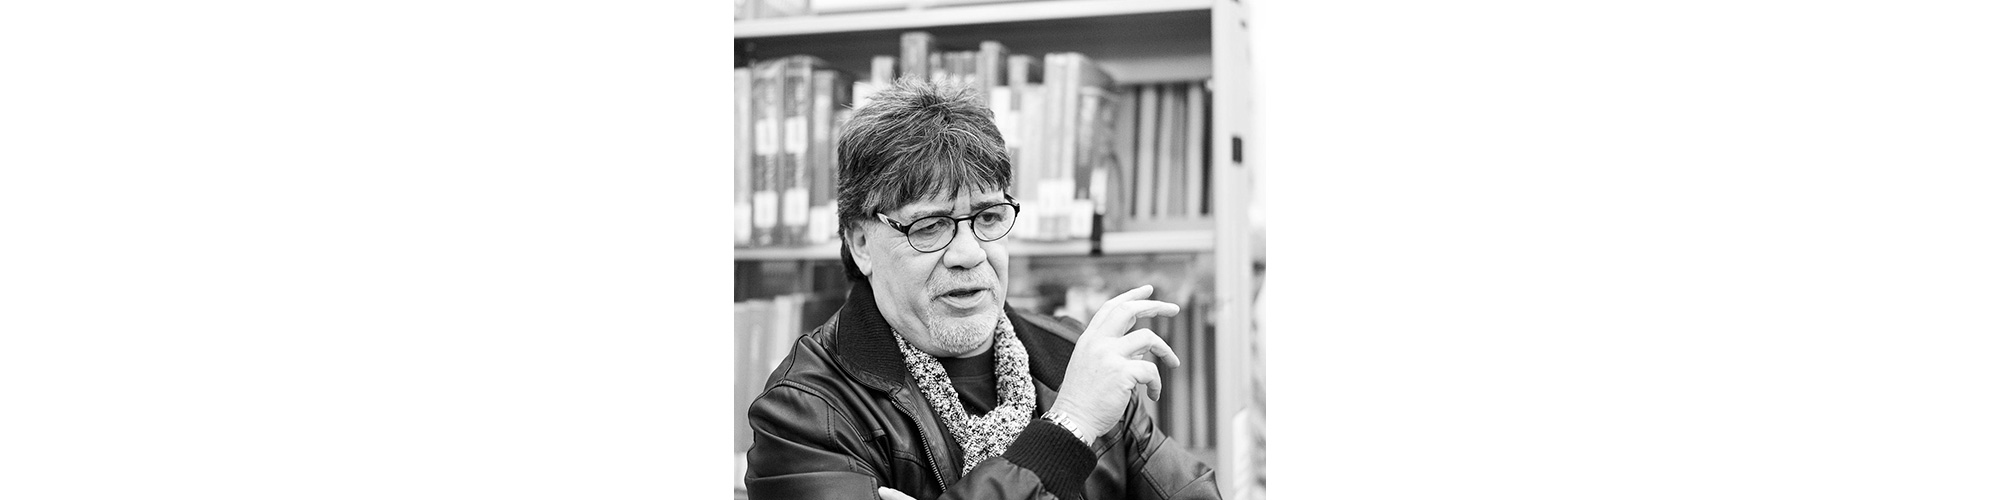 Luis Seplùlveda 16 aprile 2020